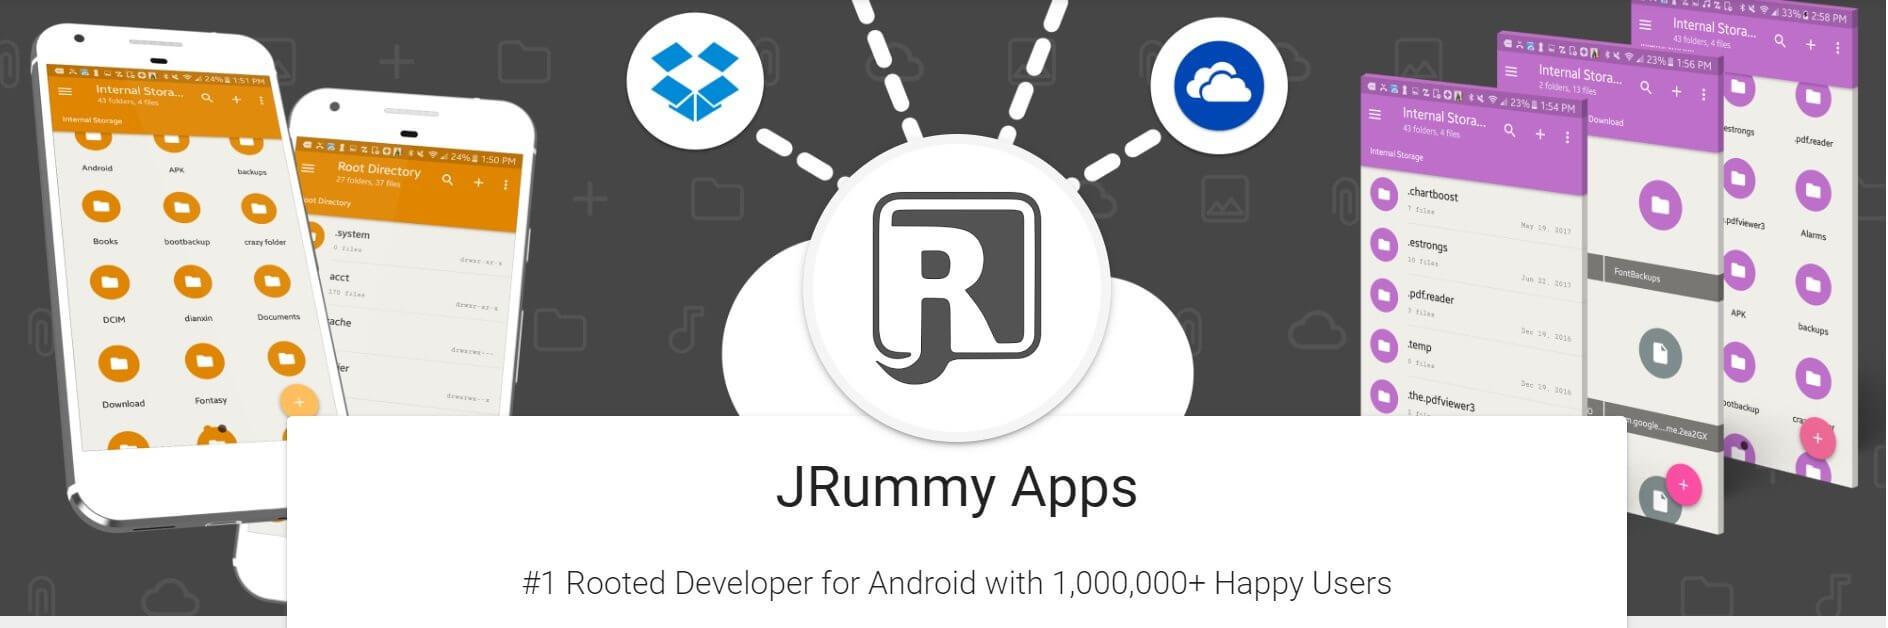 JRummy Apps